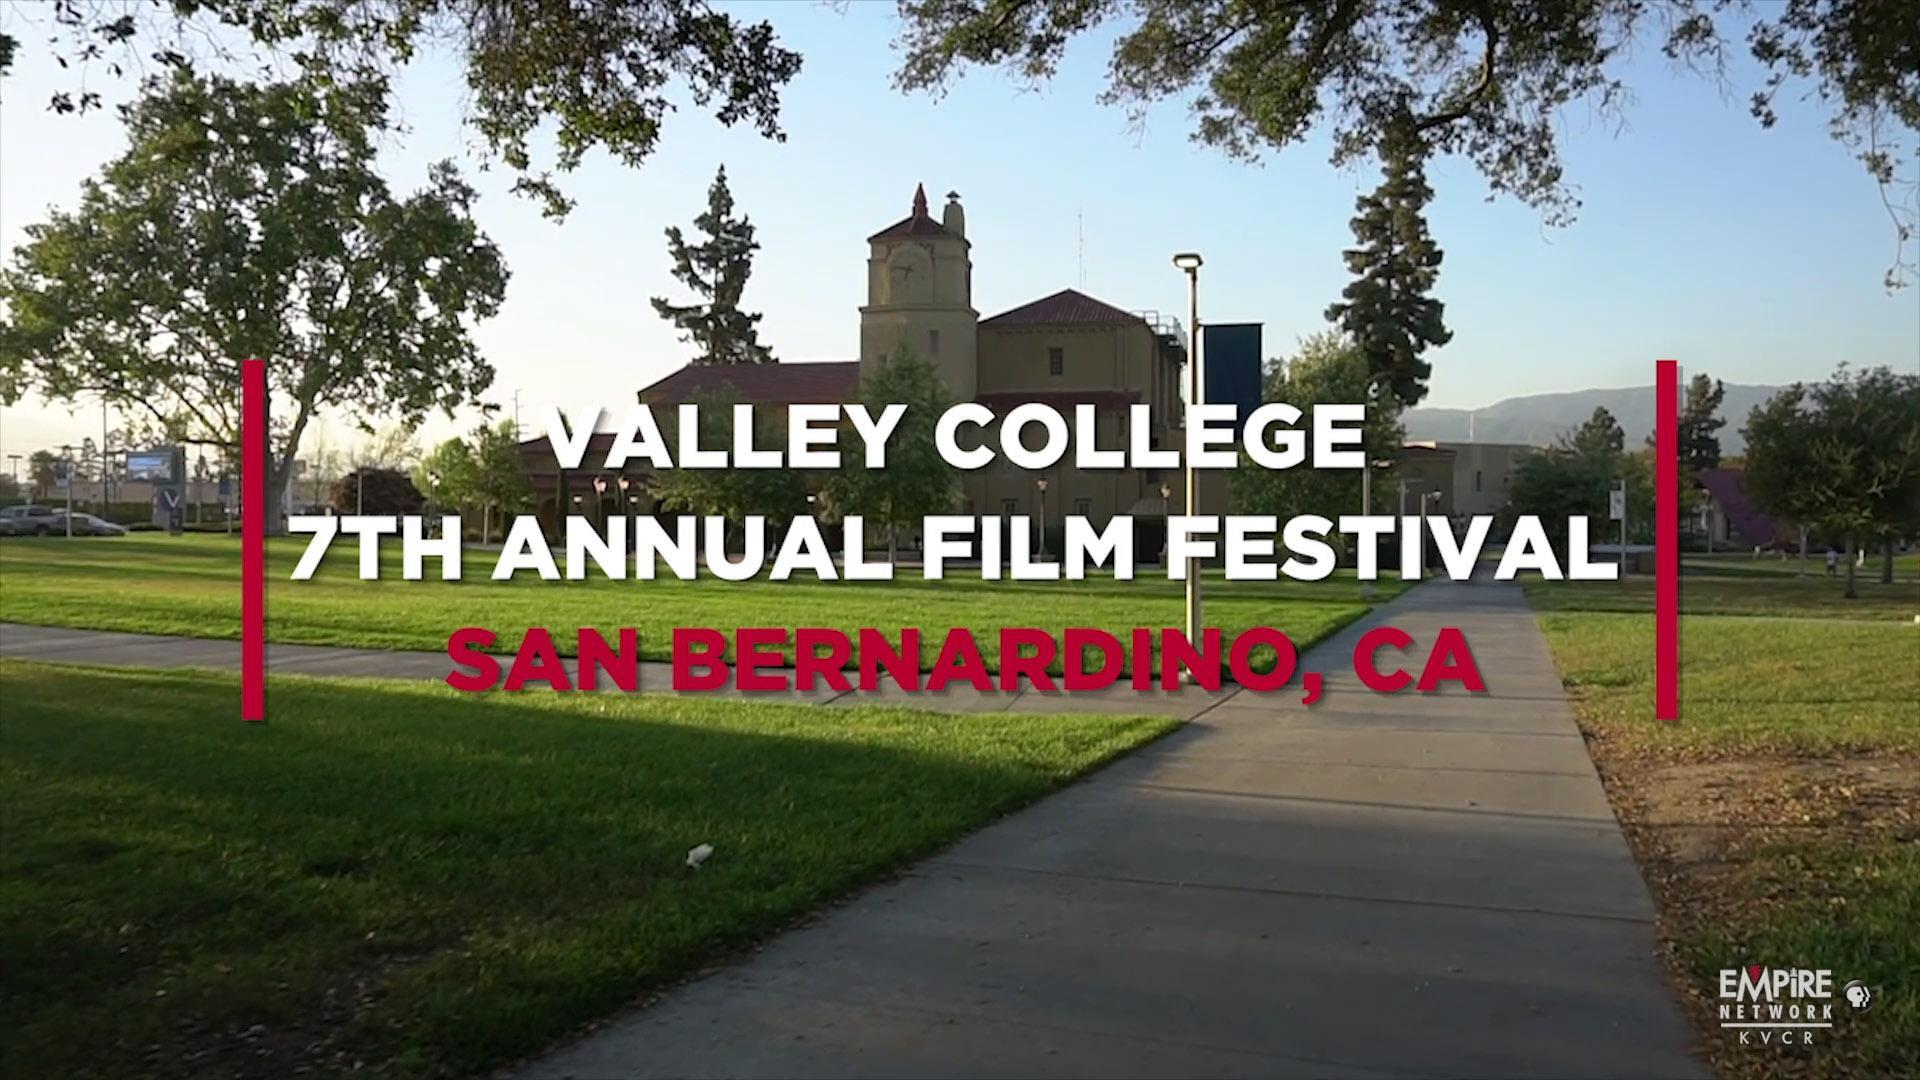 Valley College 7th Annual Film Festival